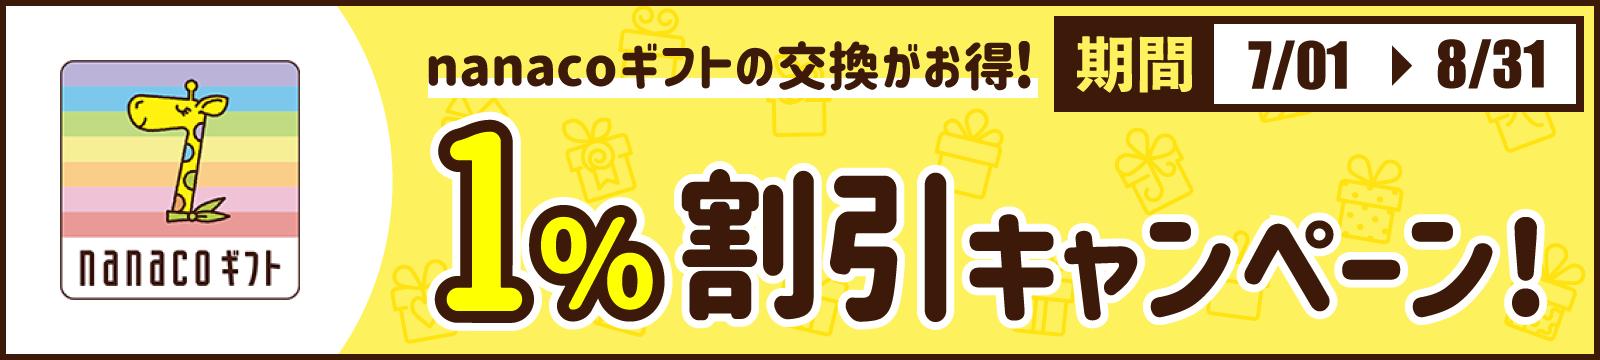 nanaco 1%割引キャンペーン